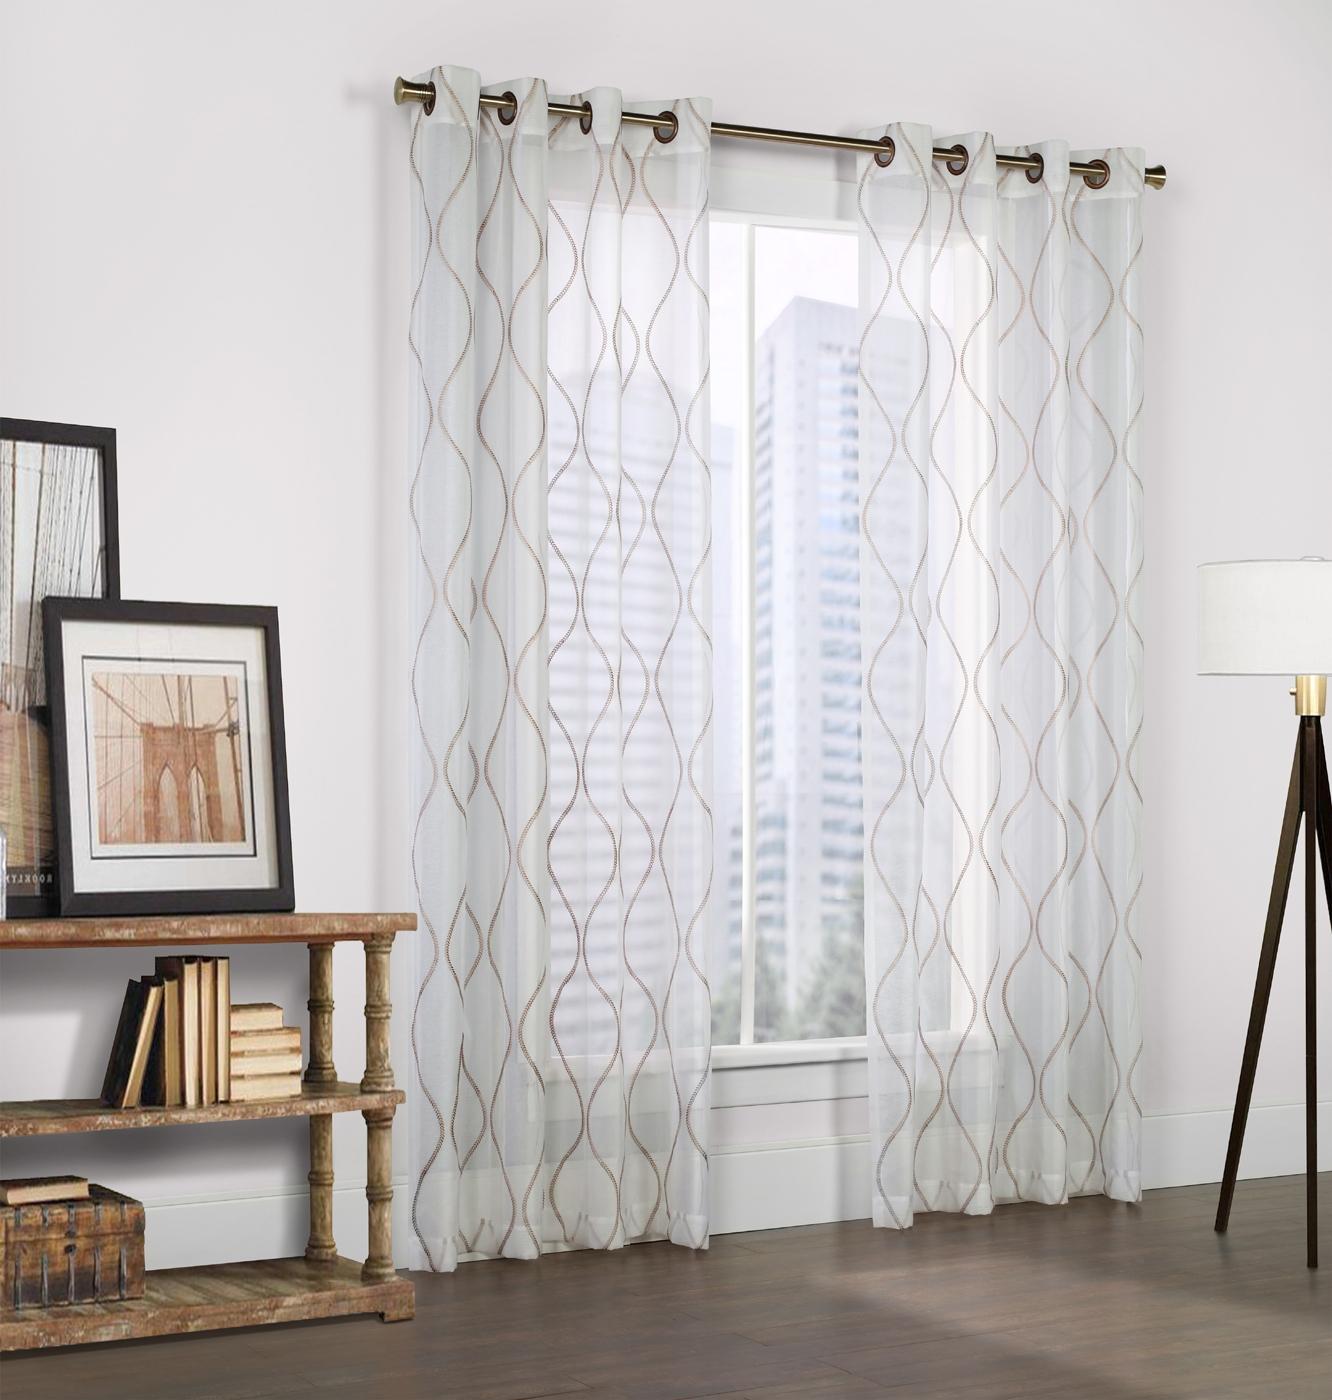 Crystal White Faux Linen Grommet Panel Couture Regarding Linen Grommet Curtains (Image 6 of 25)